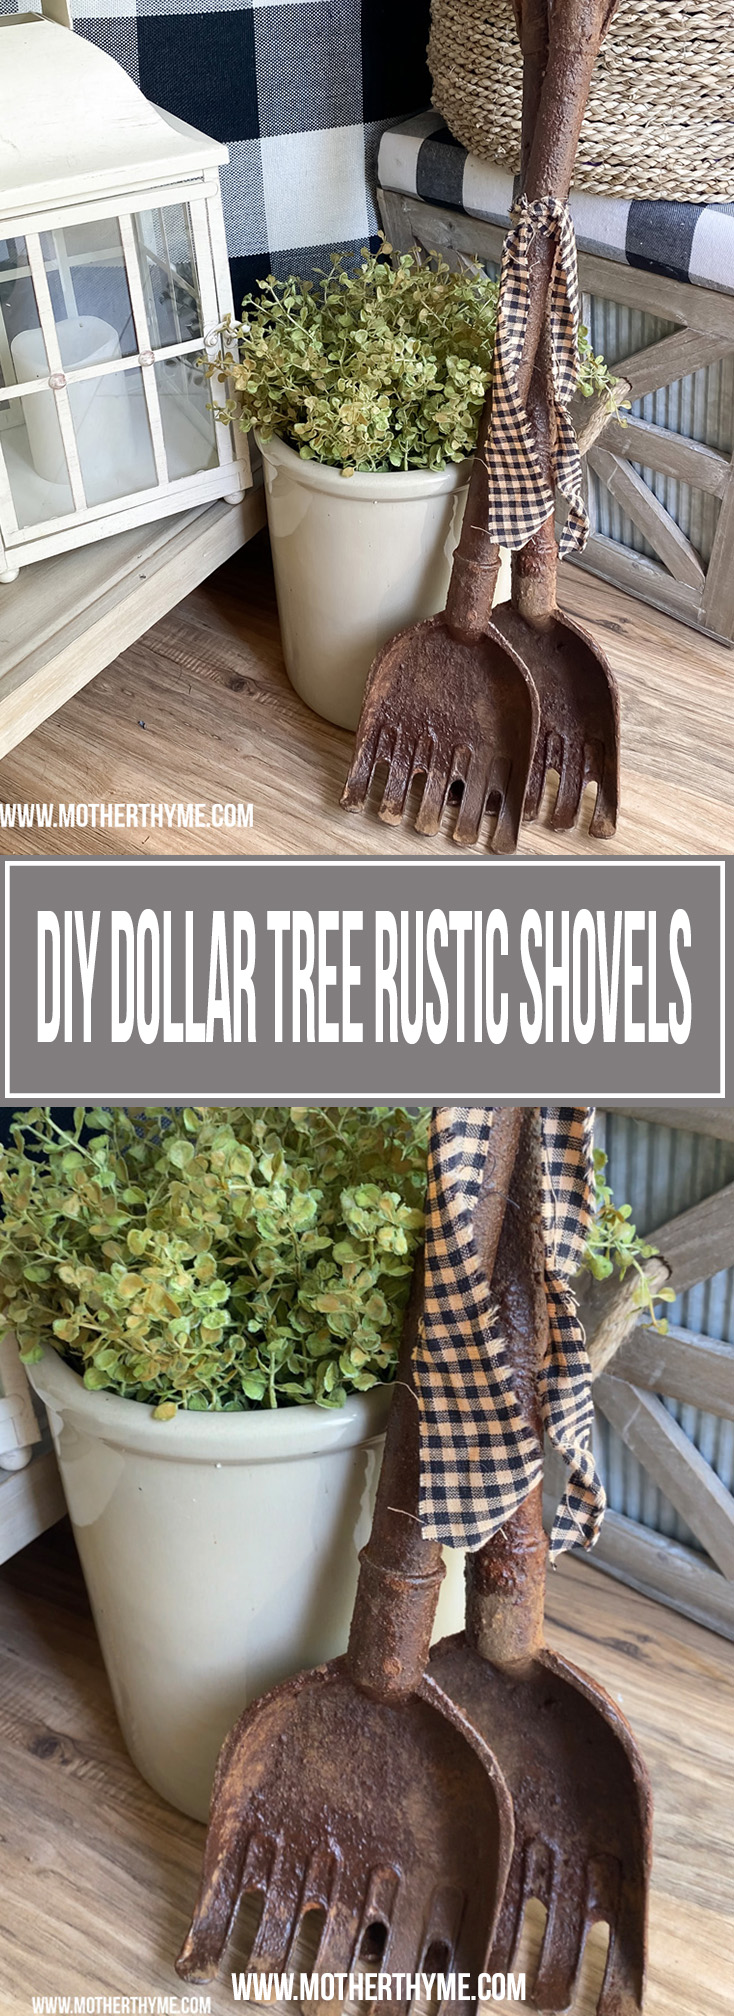 DIY DOLLAR TREE RUSTIC SHOVELS